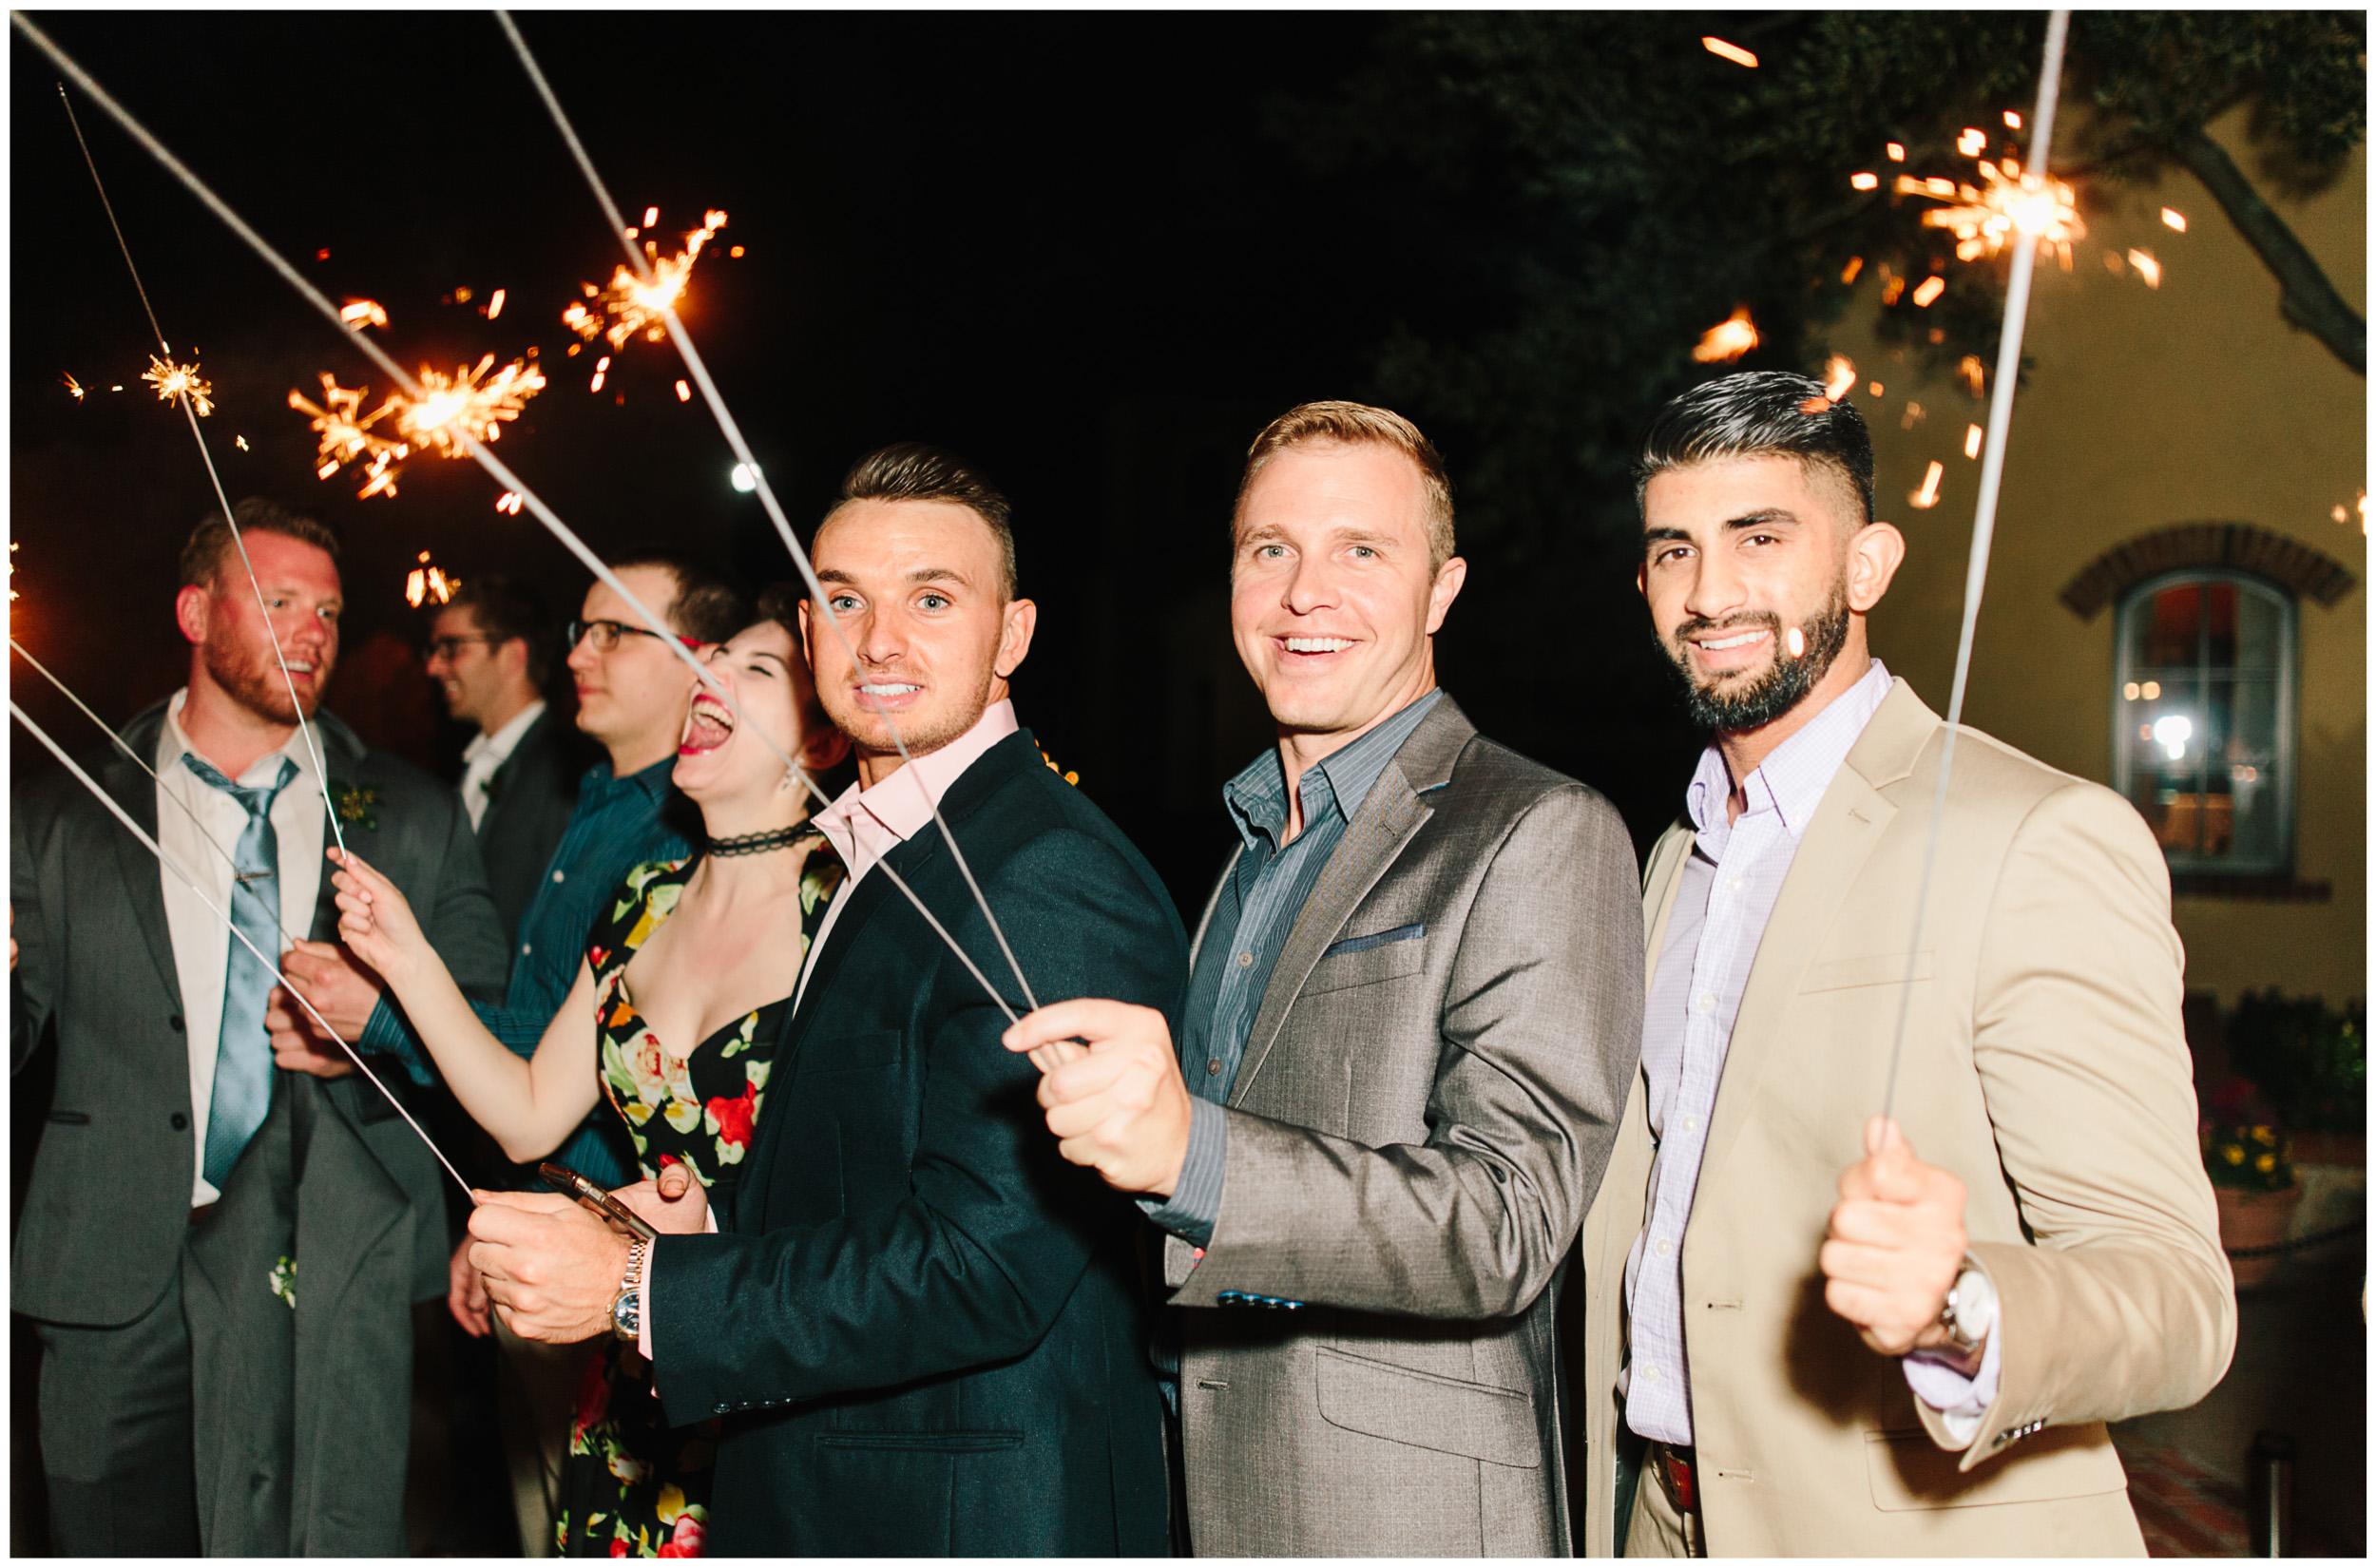 bella_collina_wedding_109a.jpg